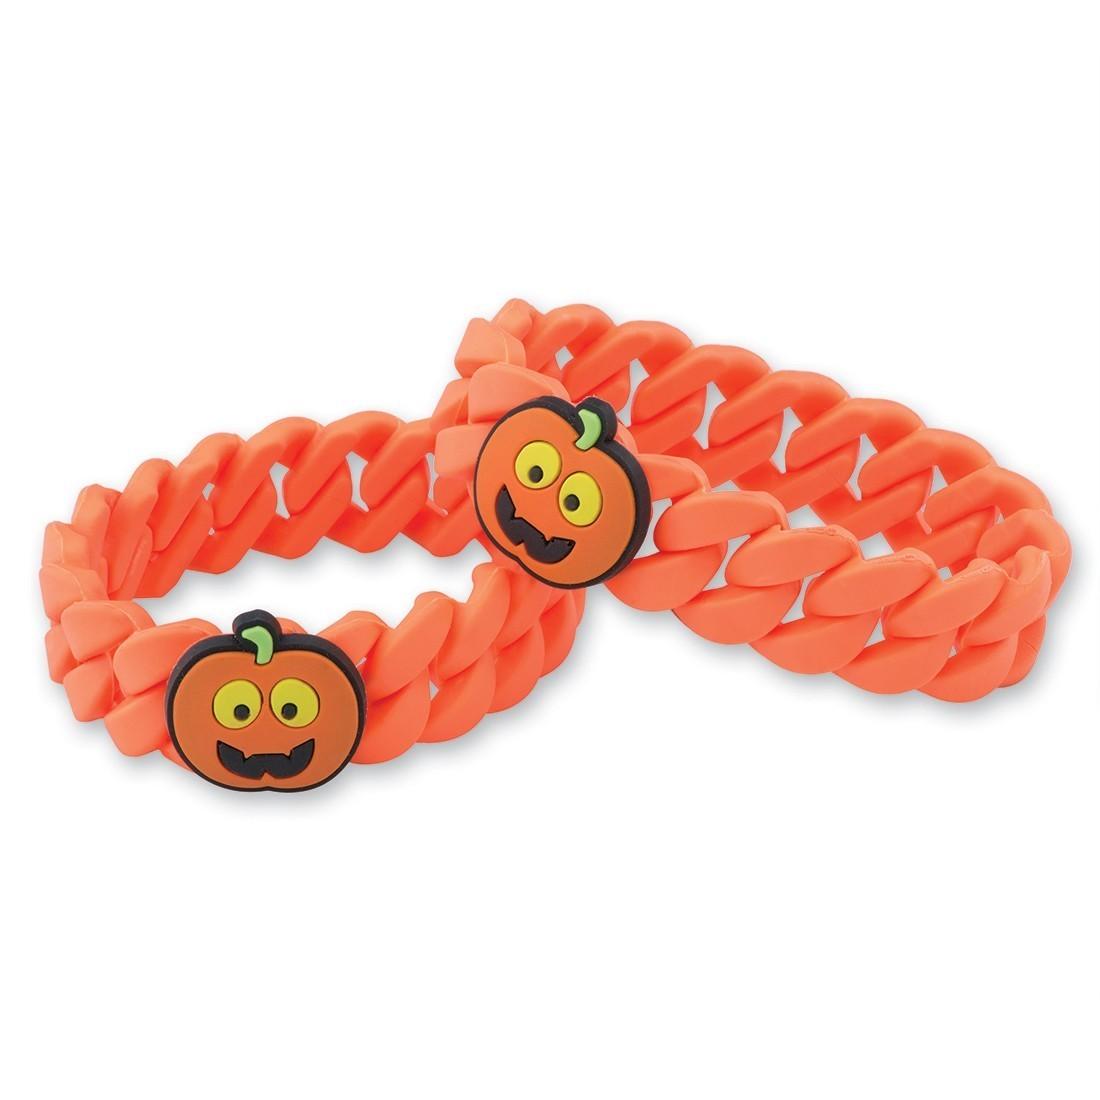 Jack O Lantern Link Bracelets [image]